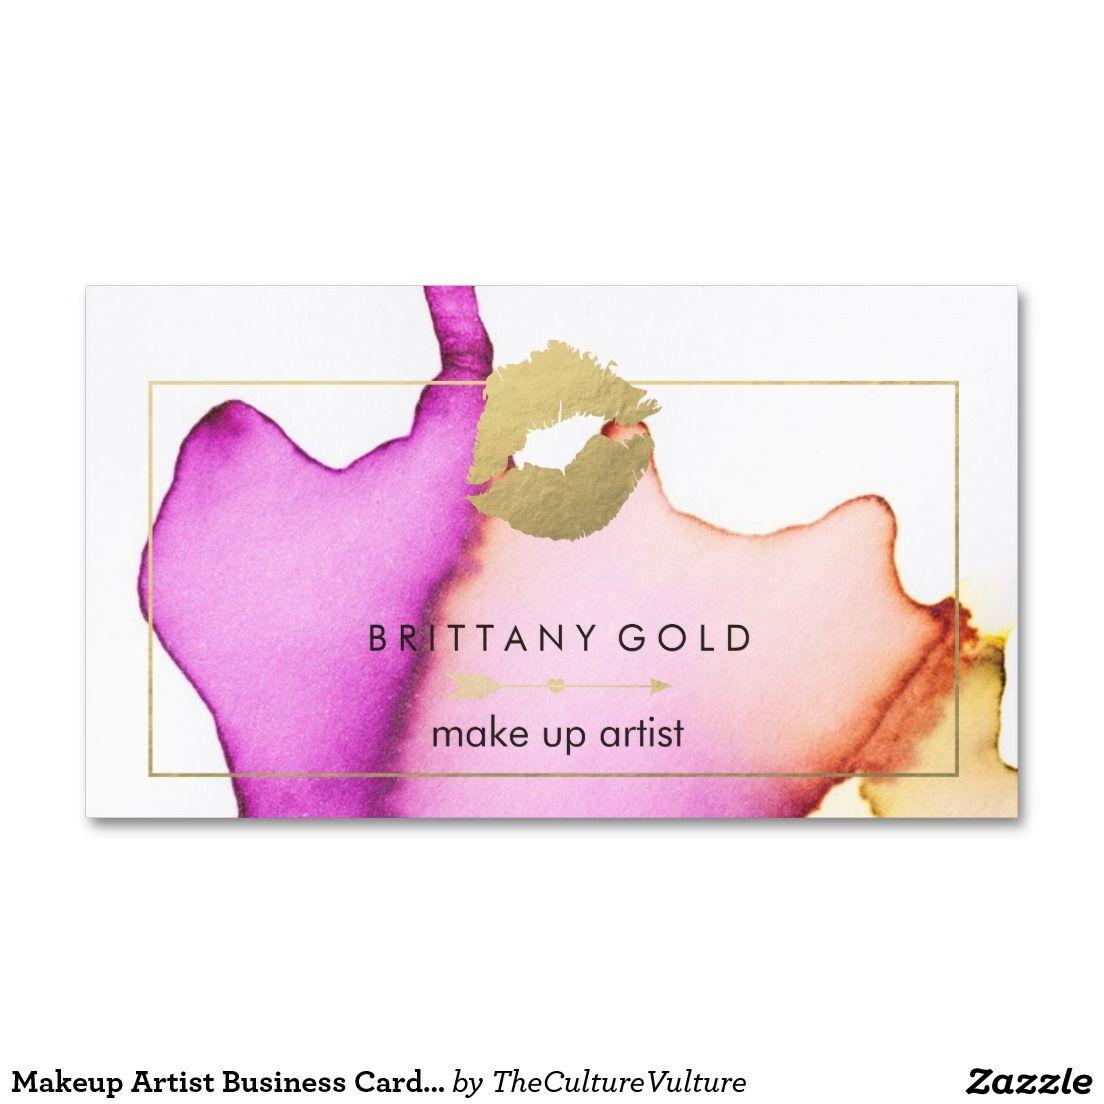 Makeup Artist Business Card - Chic Watercolor   Pinterest   Makeup ...